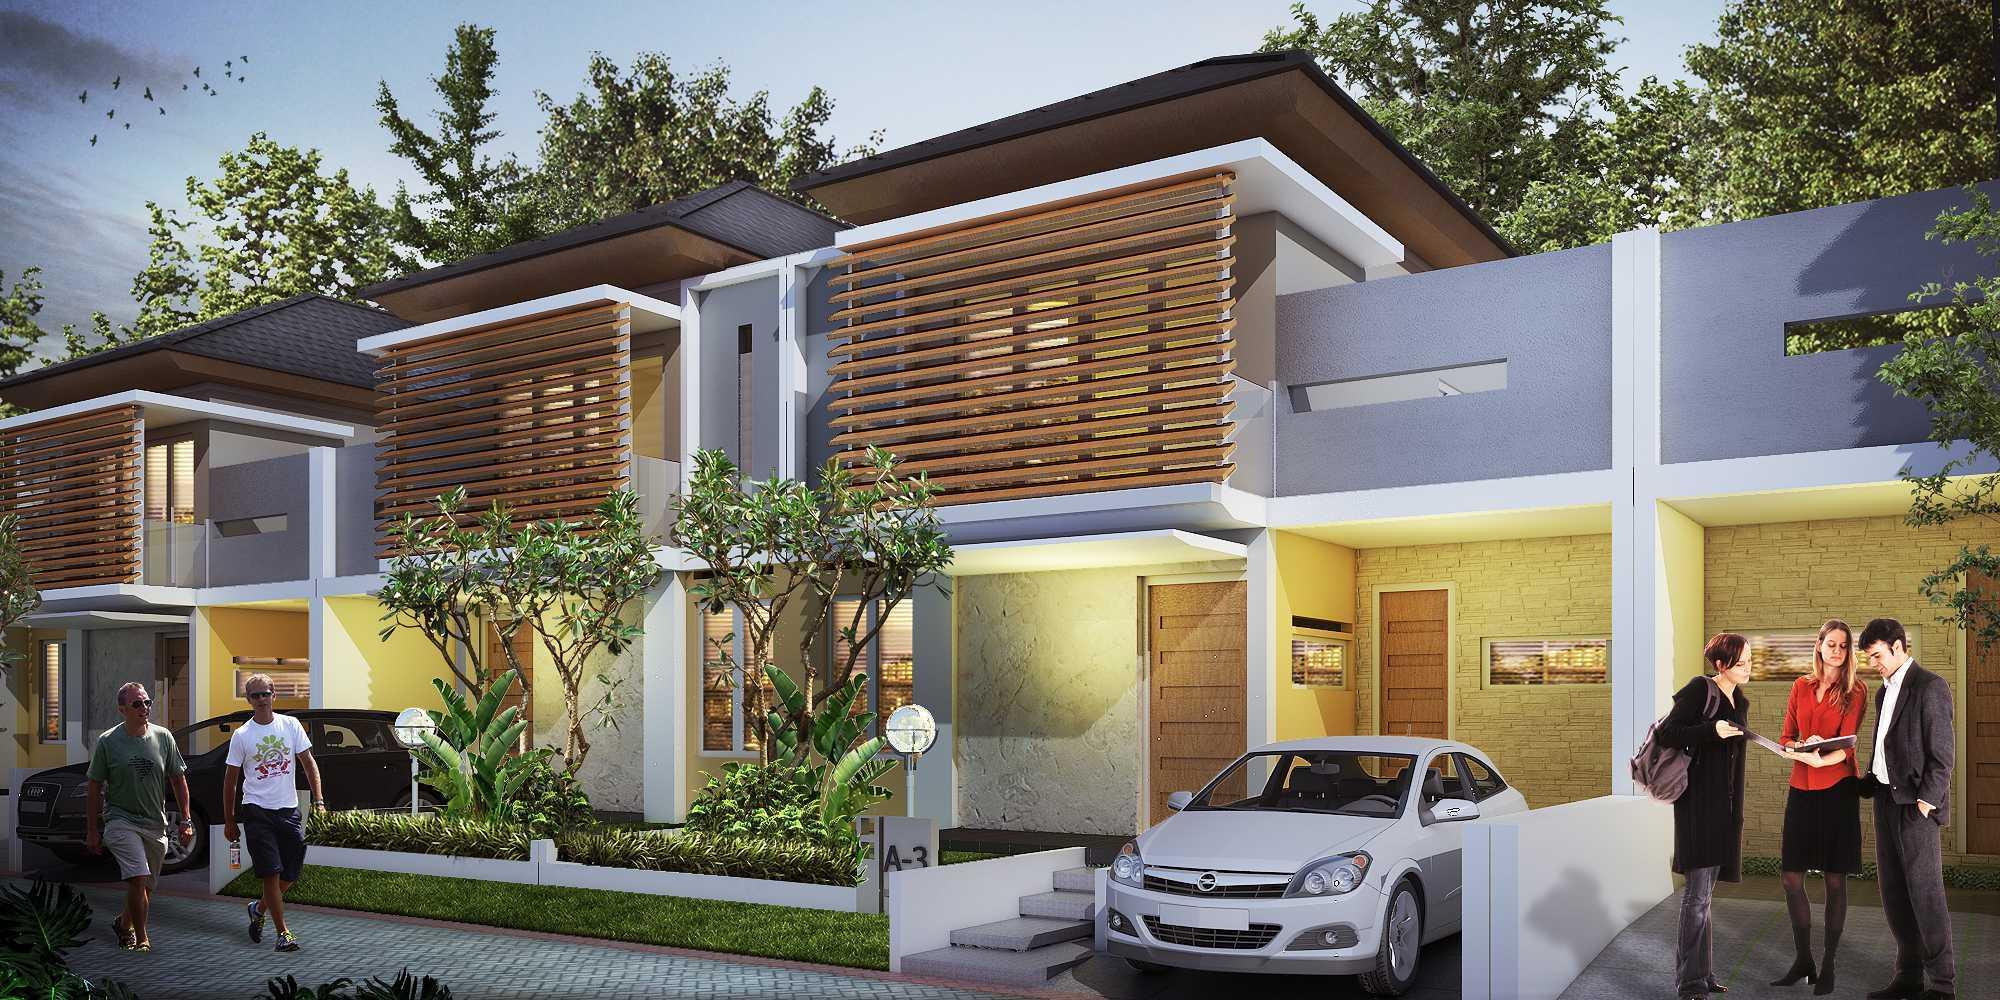 Hendra Budi Architect Quantum Royale Residence At Bantul Yogyakarta, Indonesia Yogyakarta, Indonesia Residence-Front-View-1 Kontemporer  8325